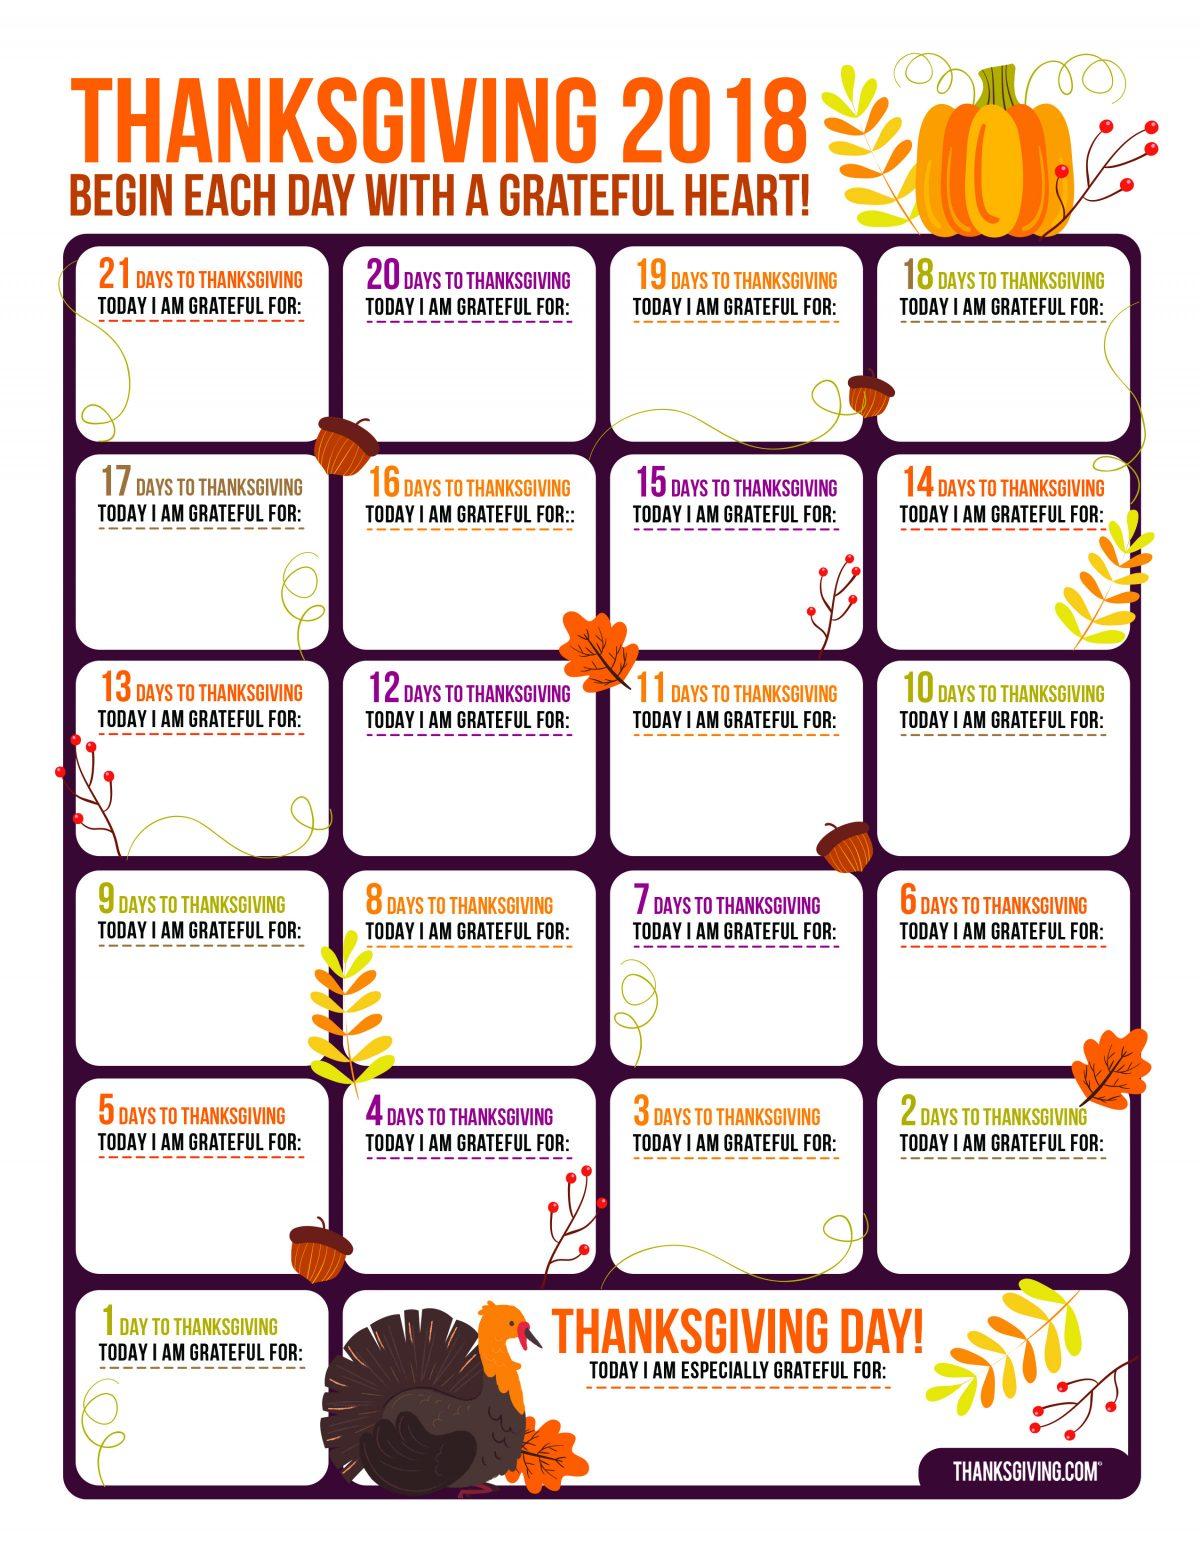 ThanksgivingCountdown